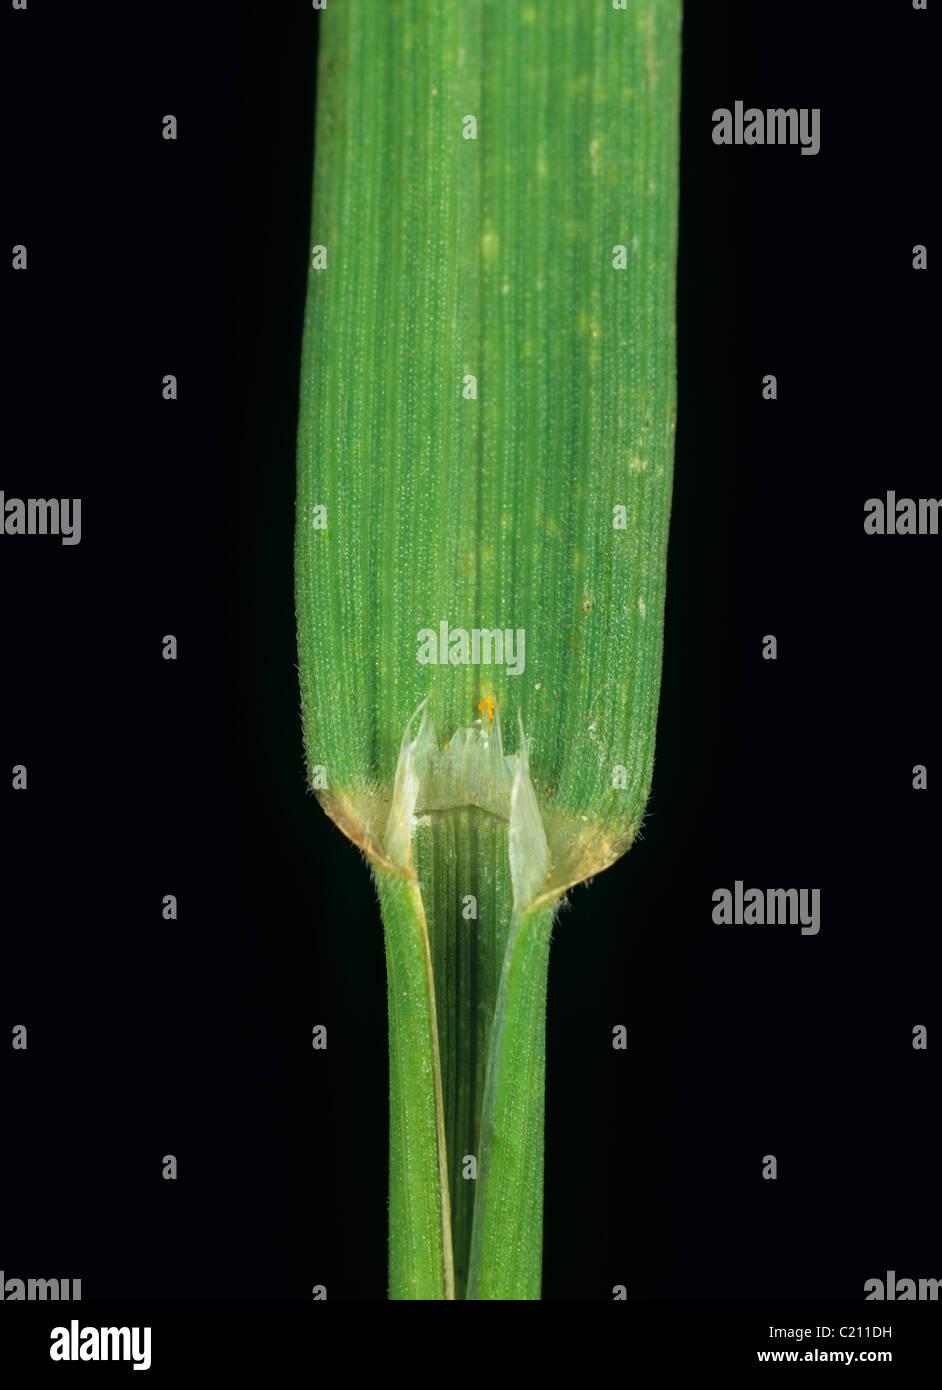 Upright brome Bromus erectus grass leaf ligule - Stock Image